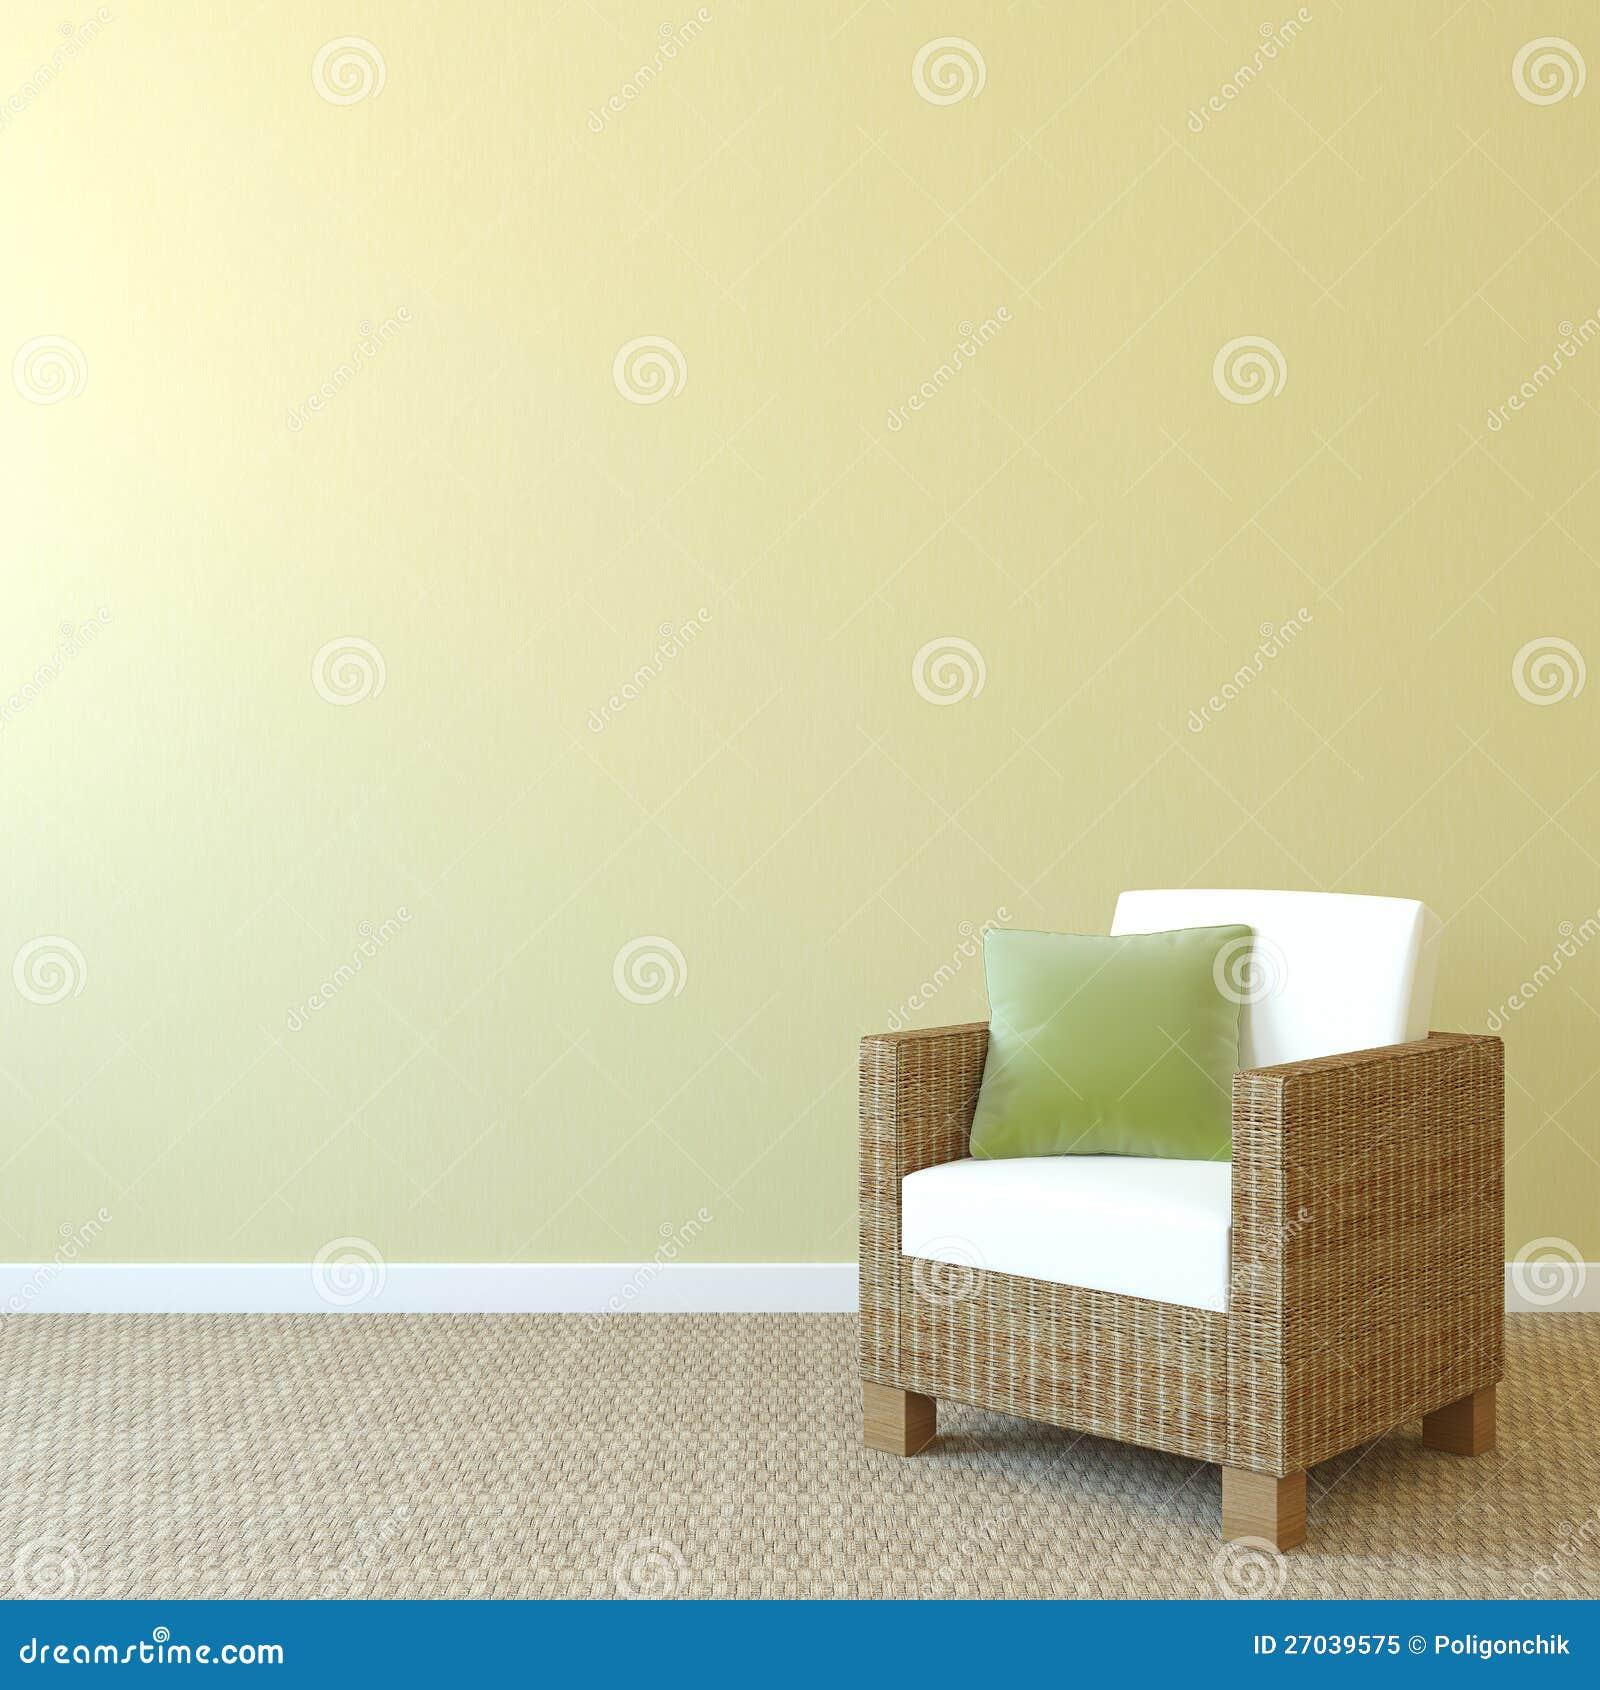 Armchair near empty wall. stock illustration. Illustration of home ...